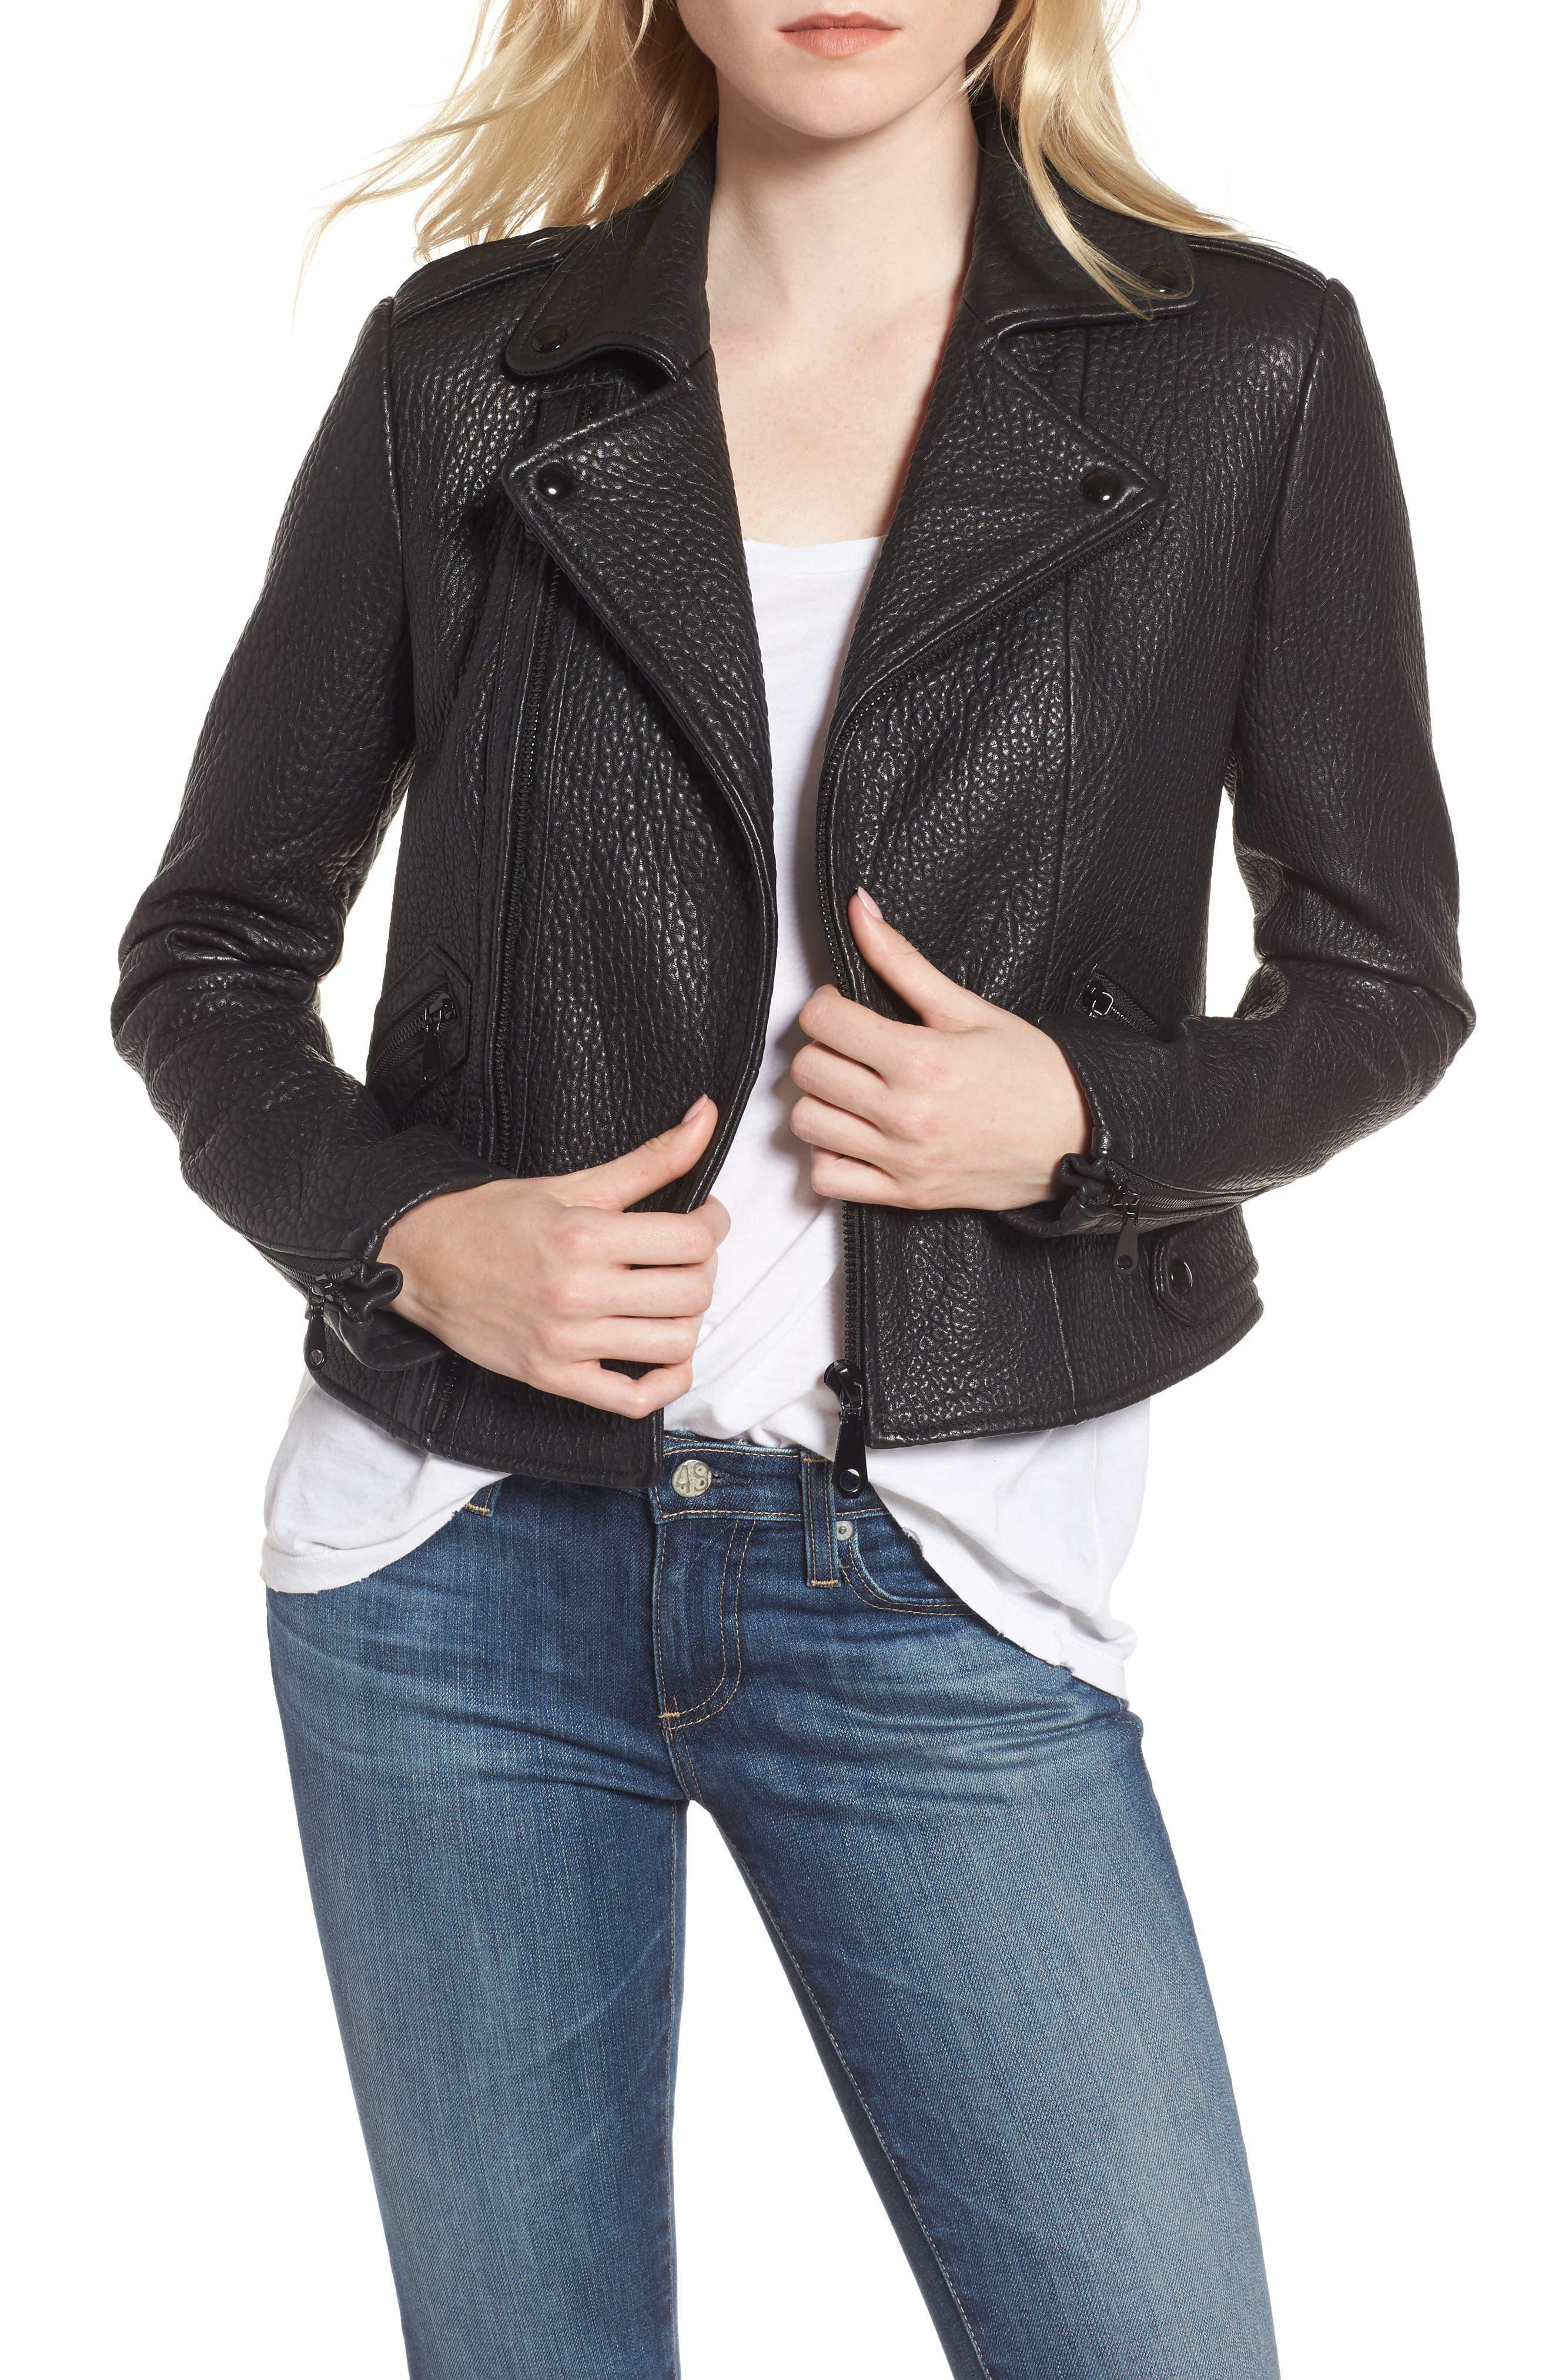 Wolf Leather Moto Jacket,                             Main thumbnail 1, color,                             001